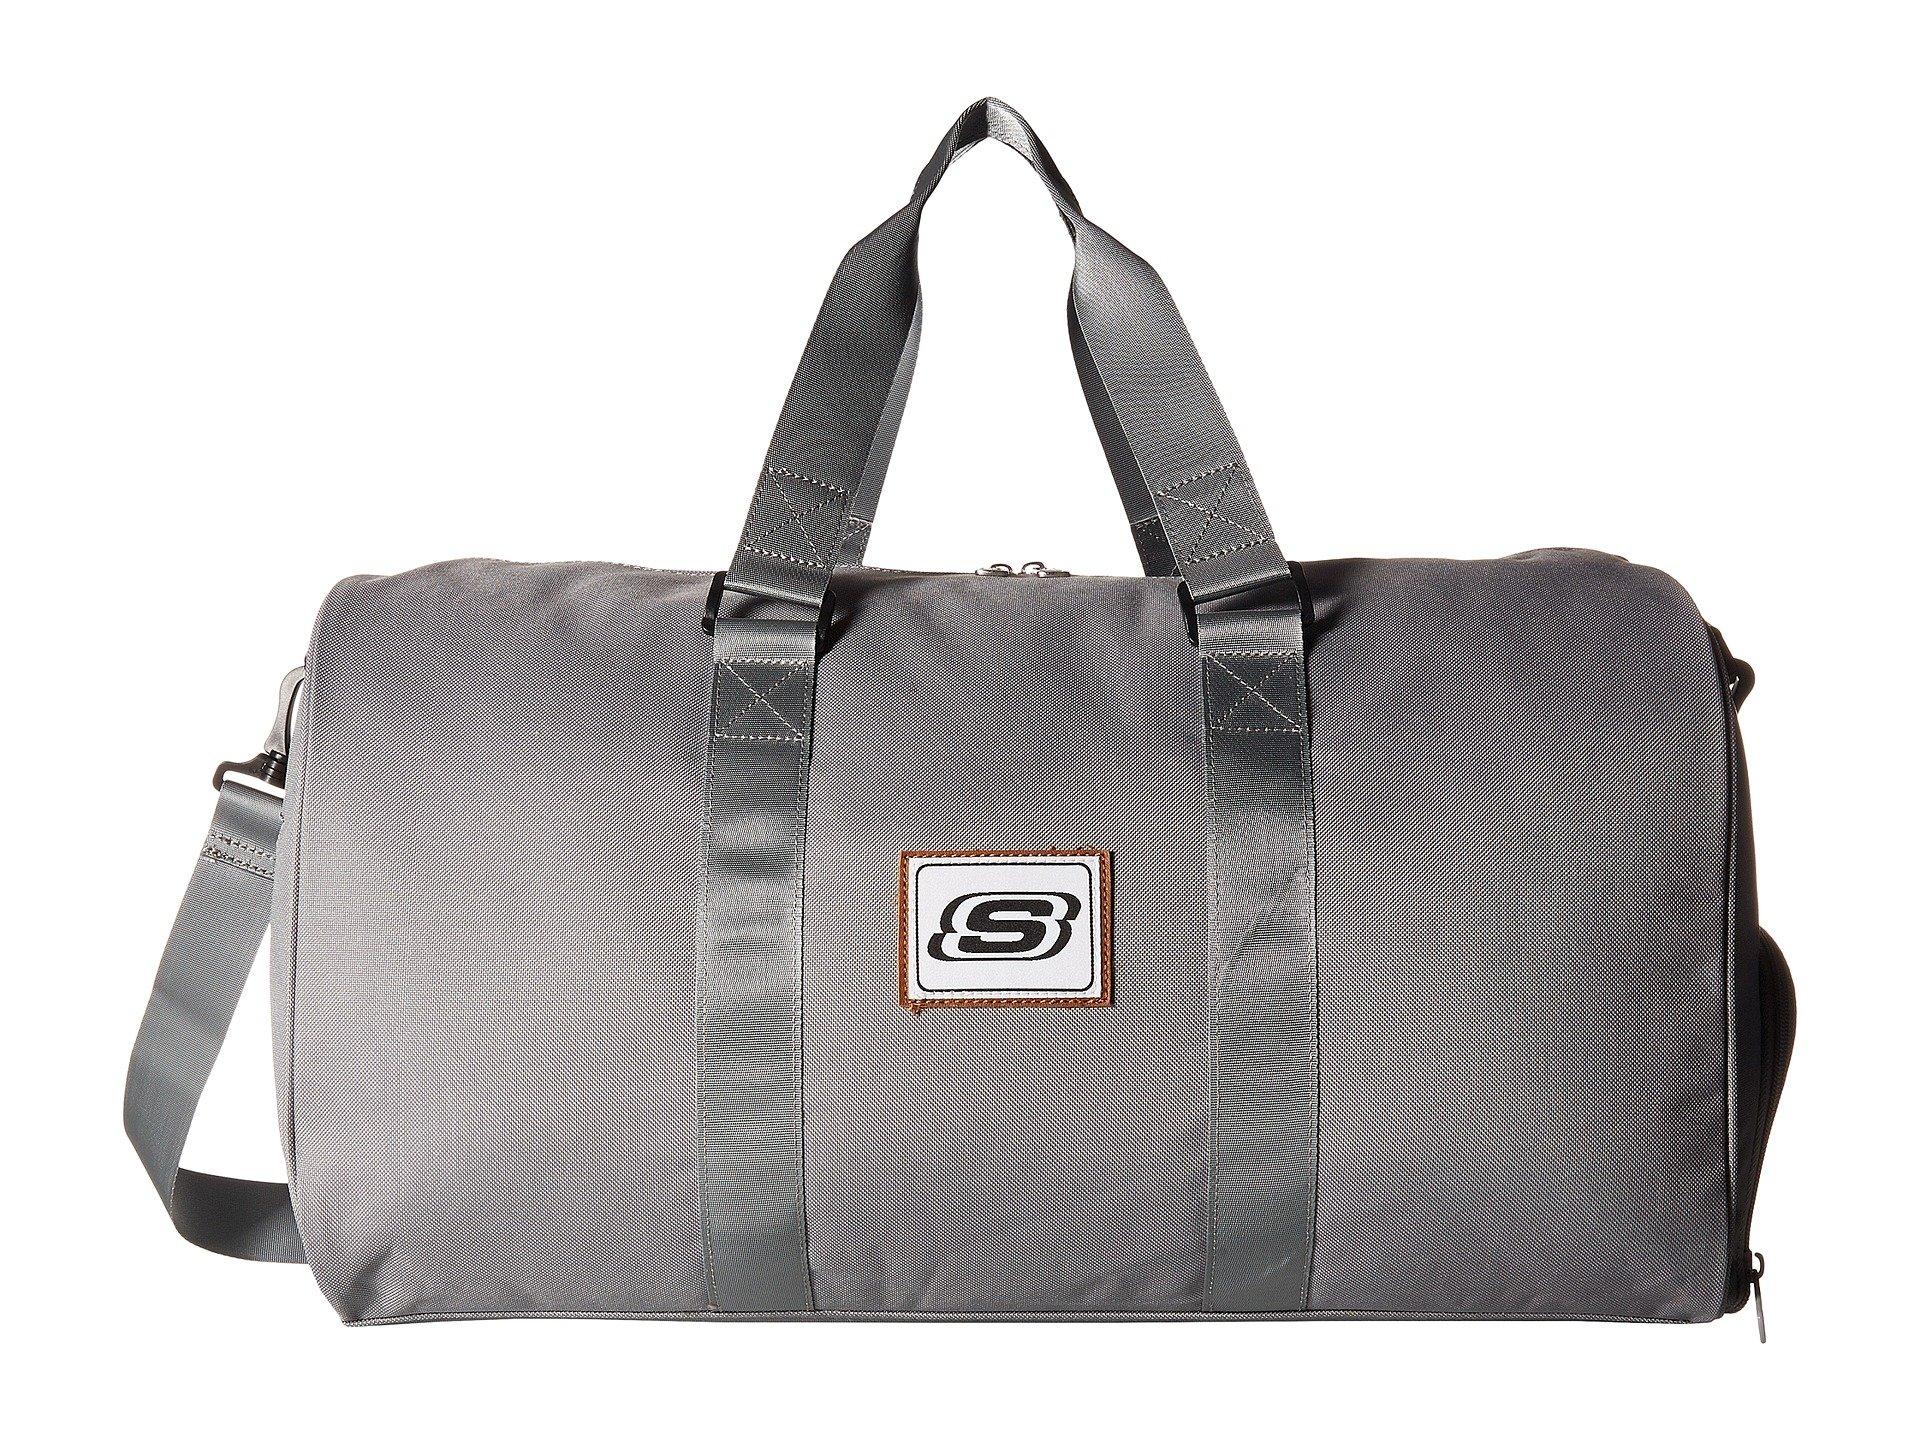 Bolso de Lona para Hombre SKECHERS Barrel Duffel Bag  + SKECHERS en VeoyCompro.net